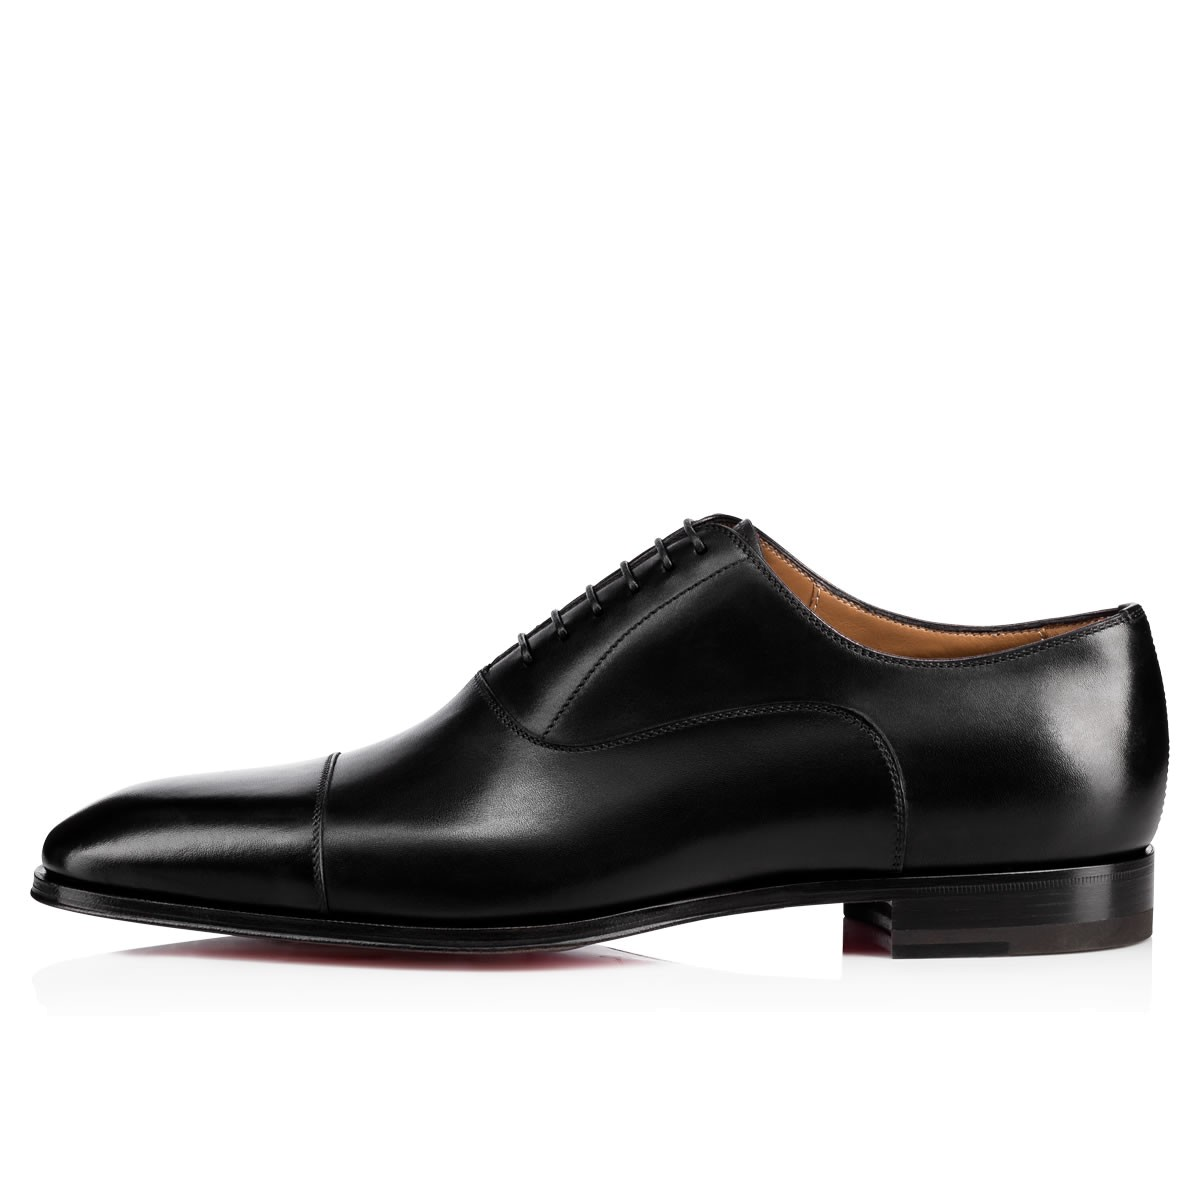 Shoes - Cousin Greg - Christian Louboutin